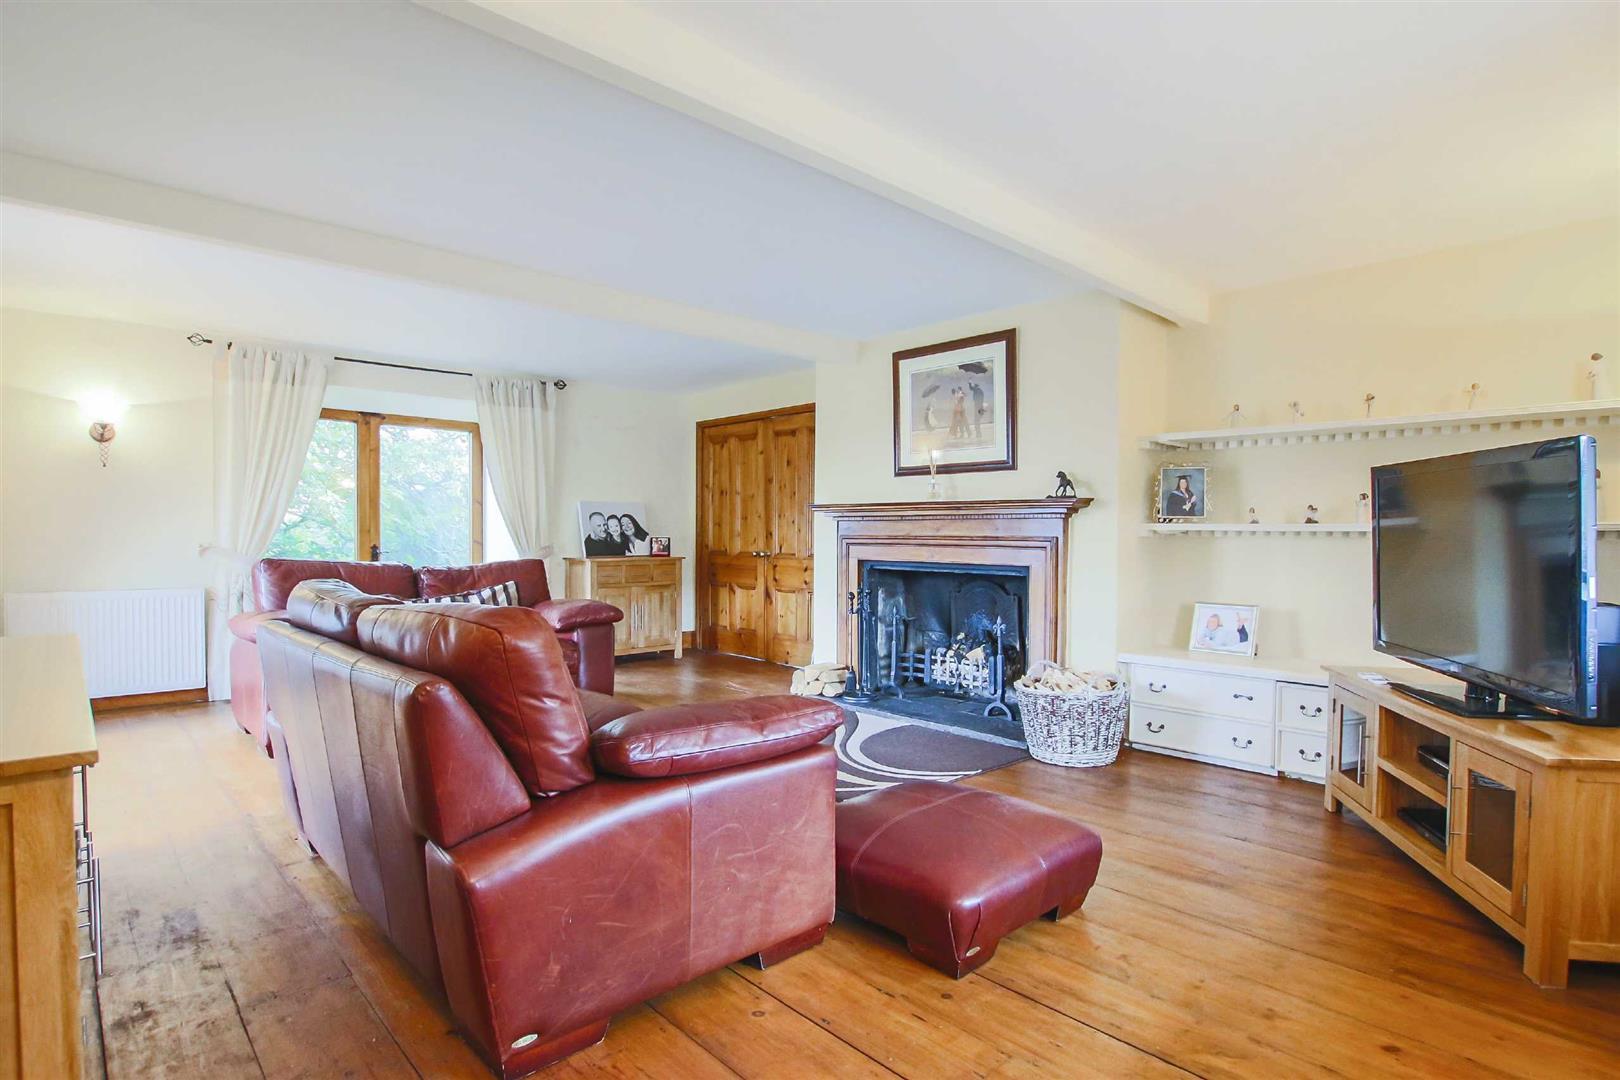 5 Bedroom Barn Conversion For Sale - p026519_19.jpg